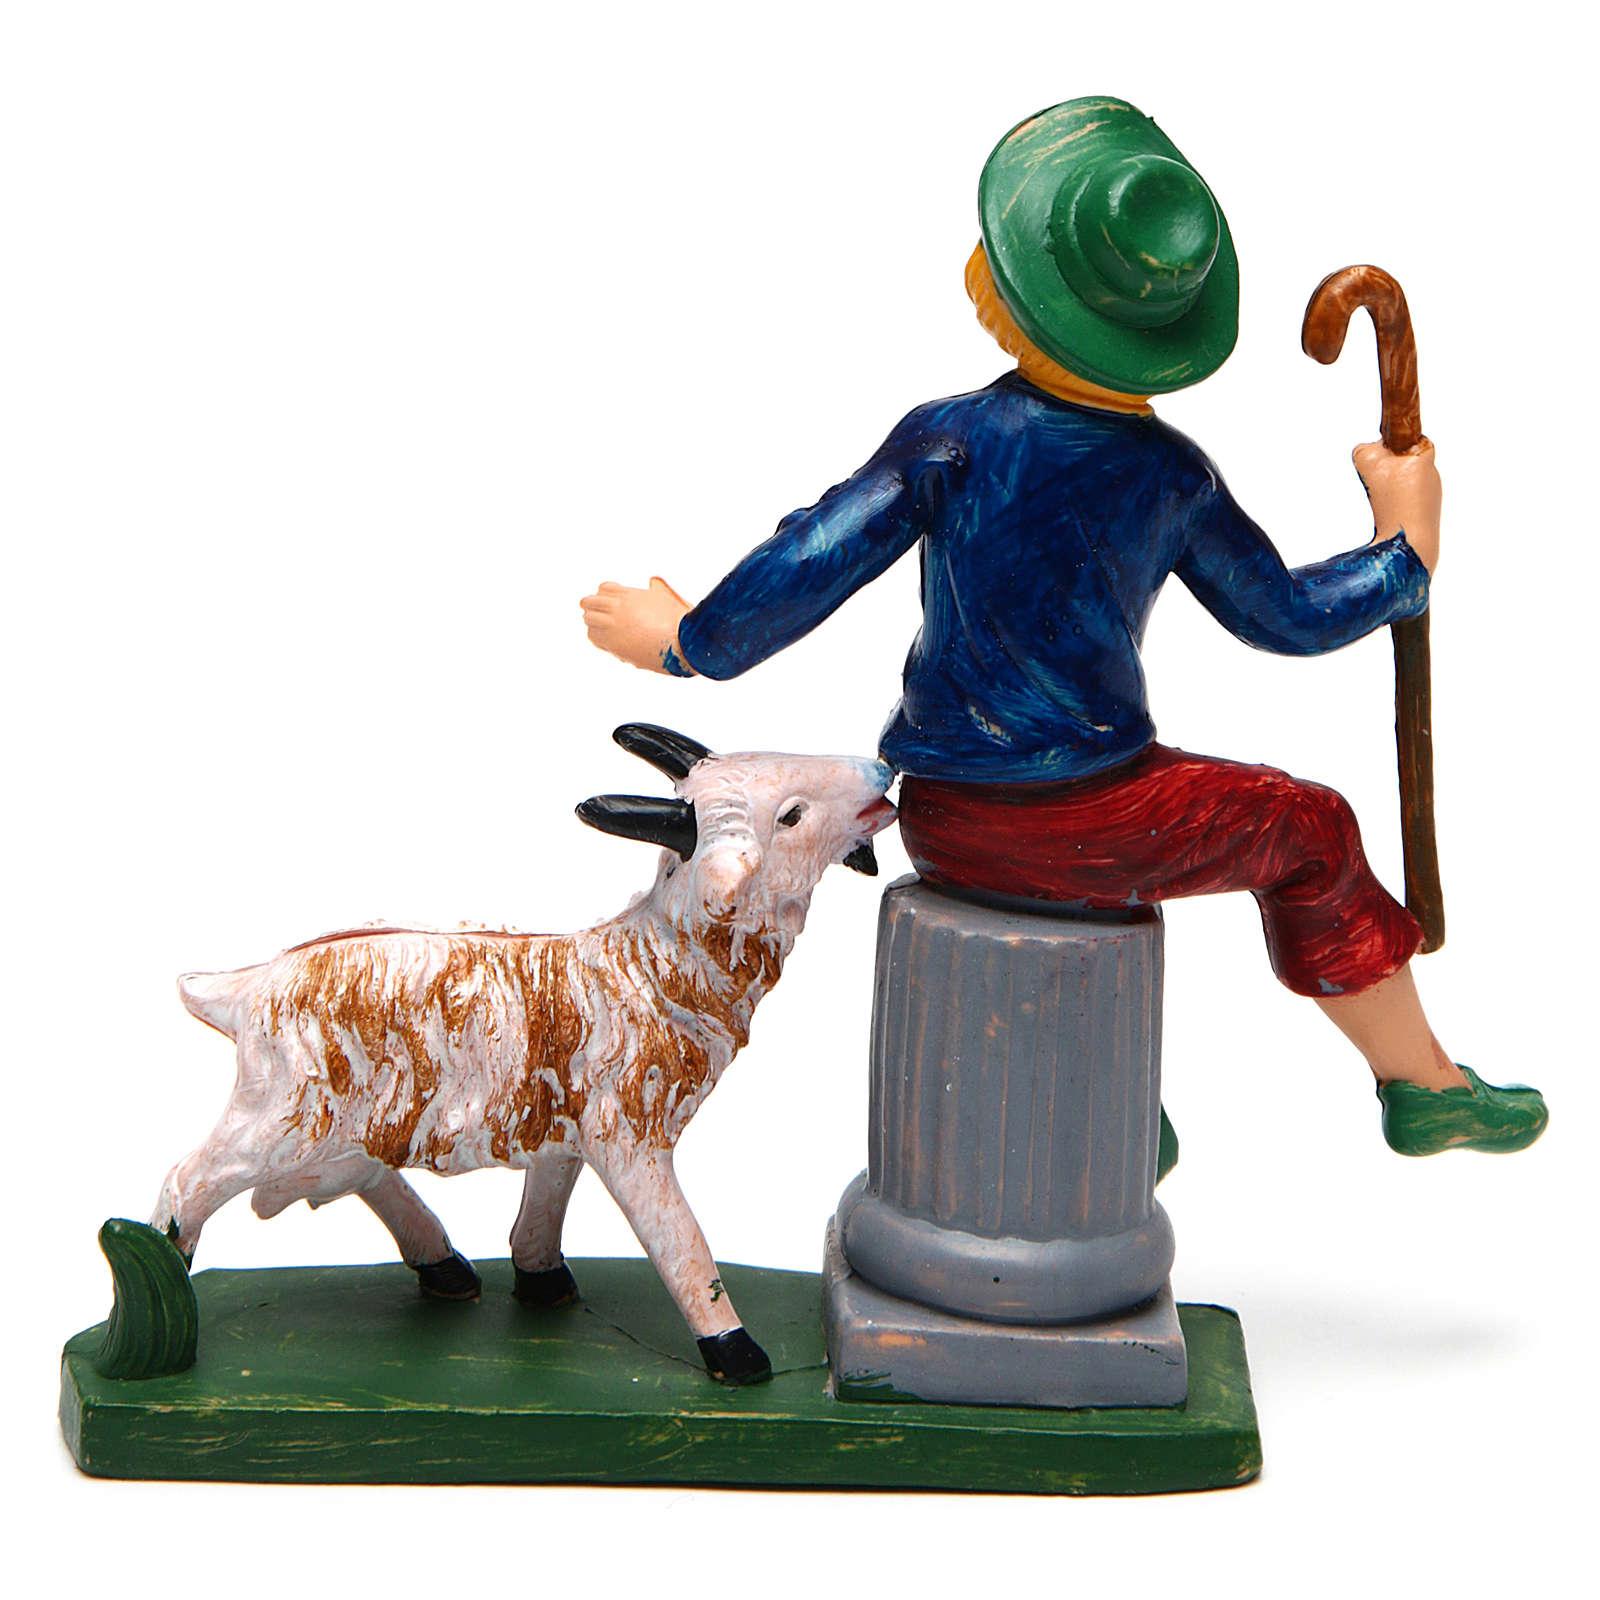 Hombre sentado con oveja 10 cm de altura media belén 3